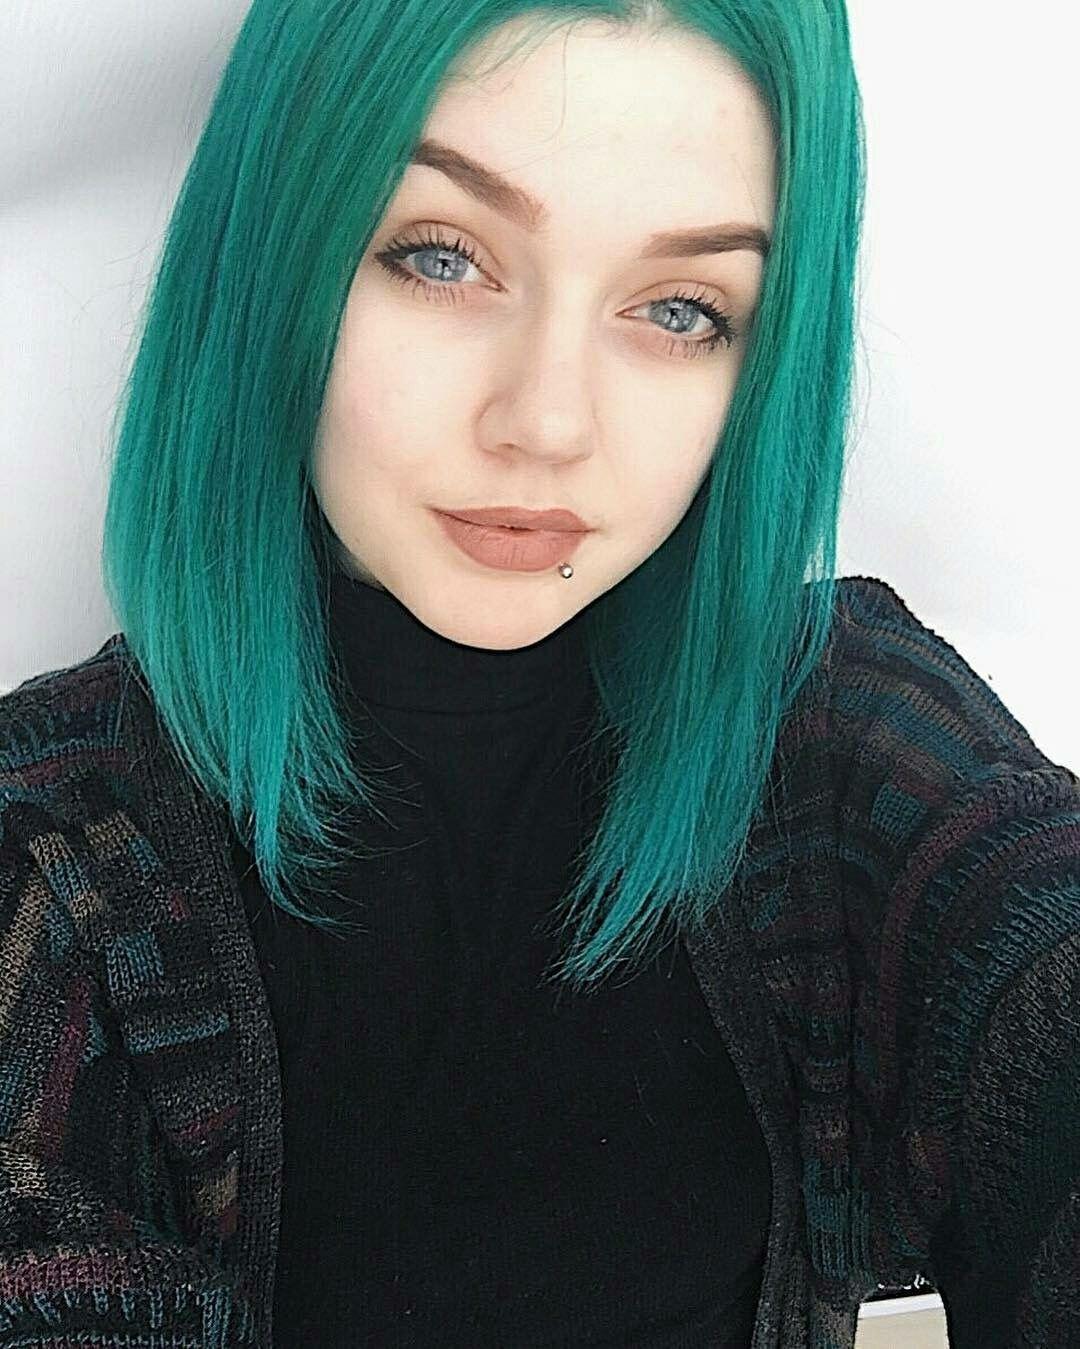 Teal hair ♡ Dye my hair, Cool hair color, Green hair